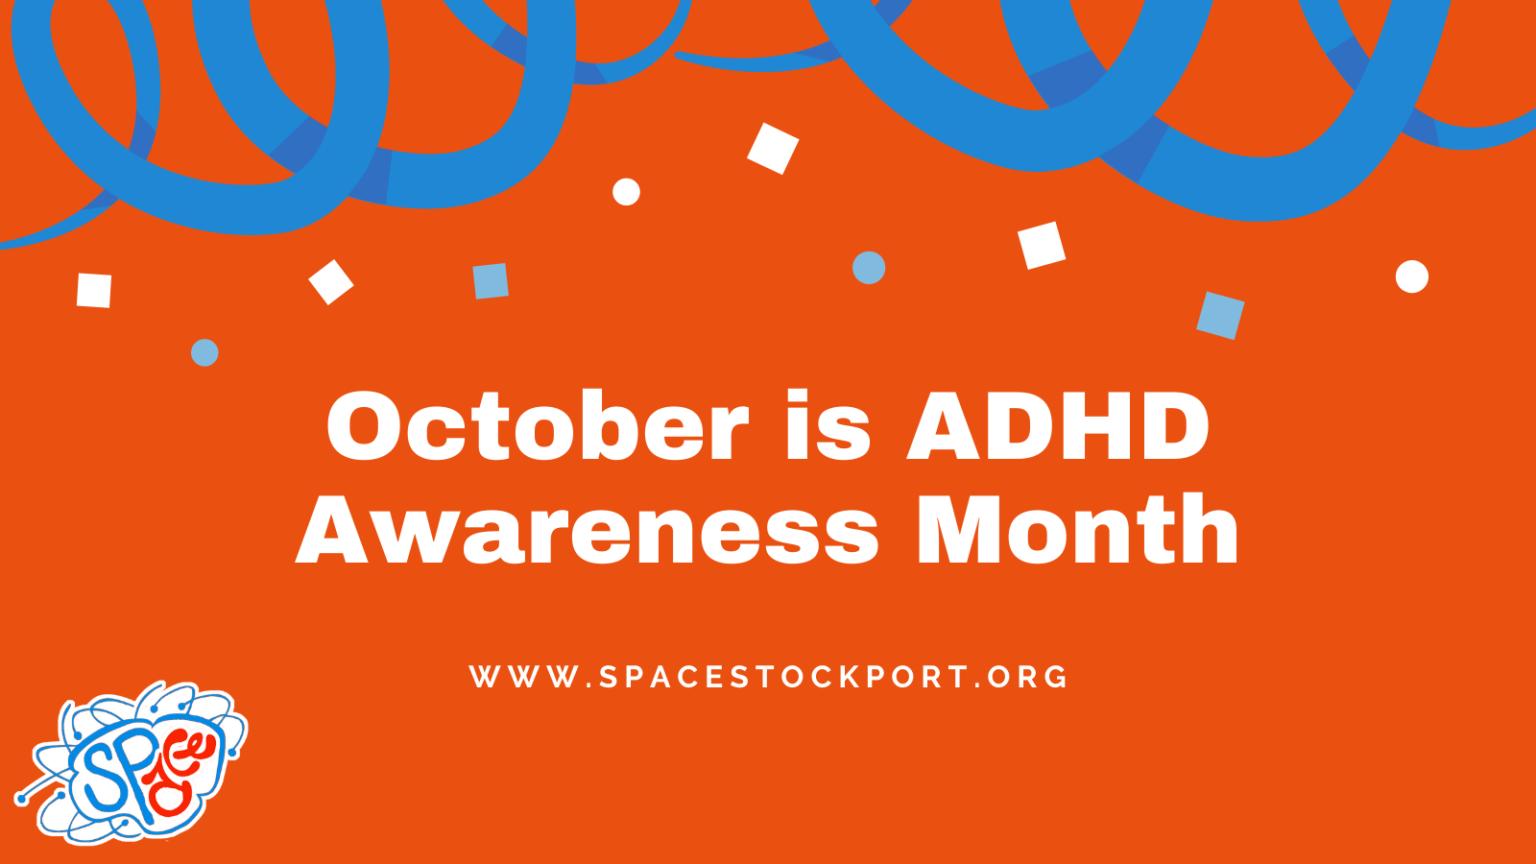 ADHD Awareness Month 2020